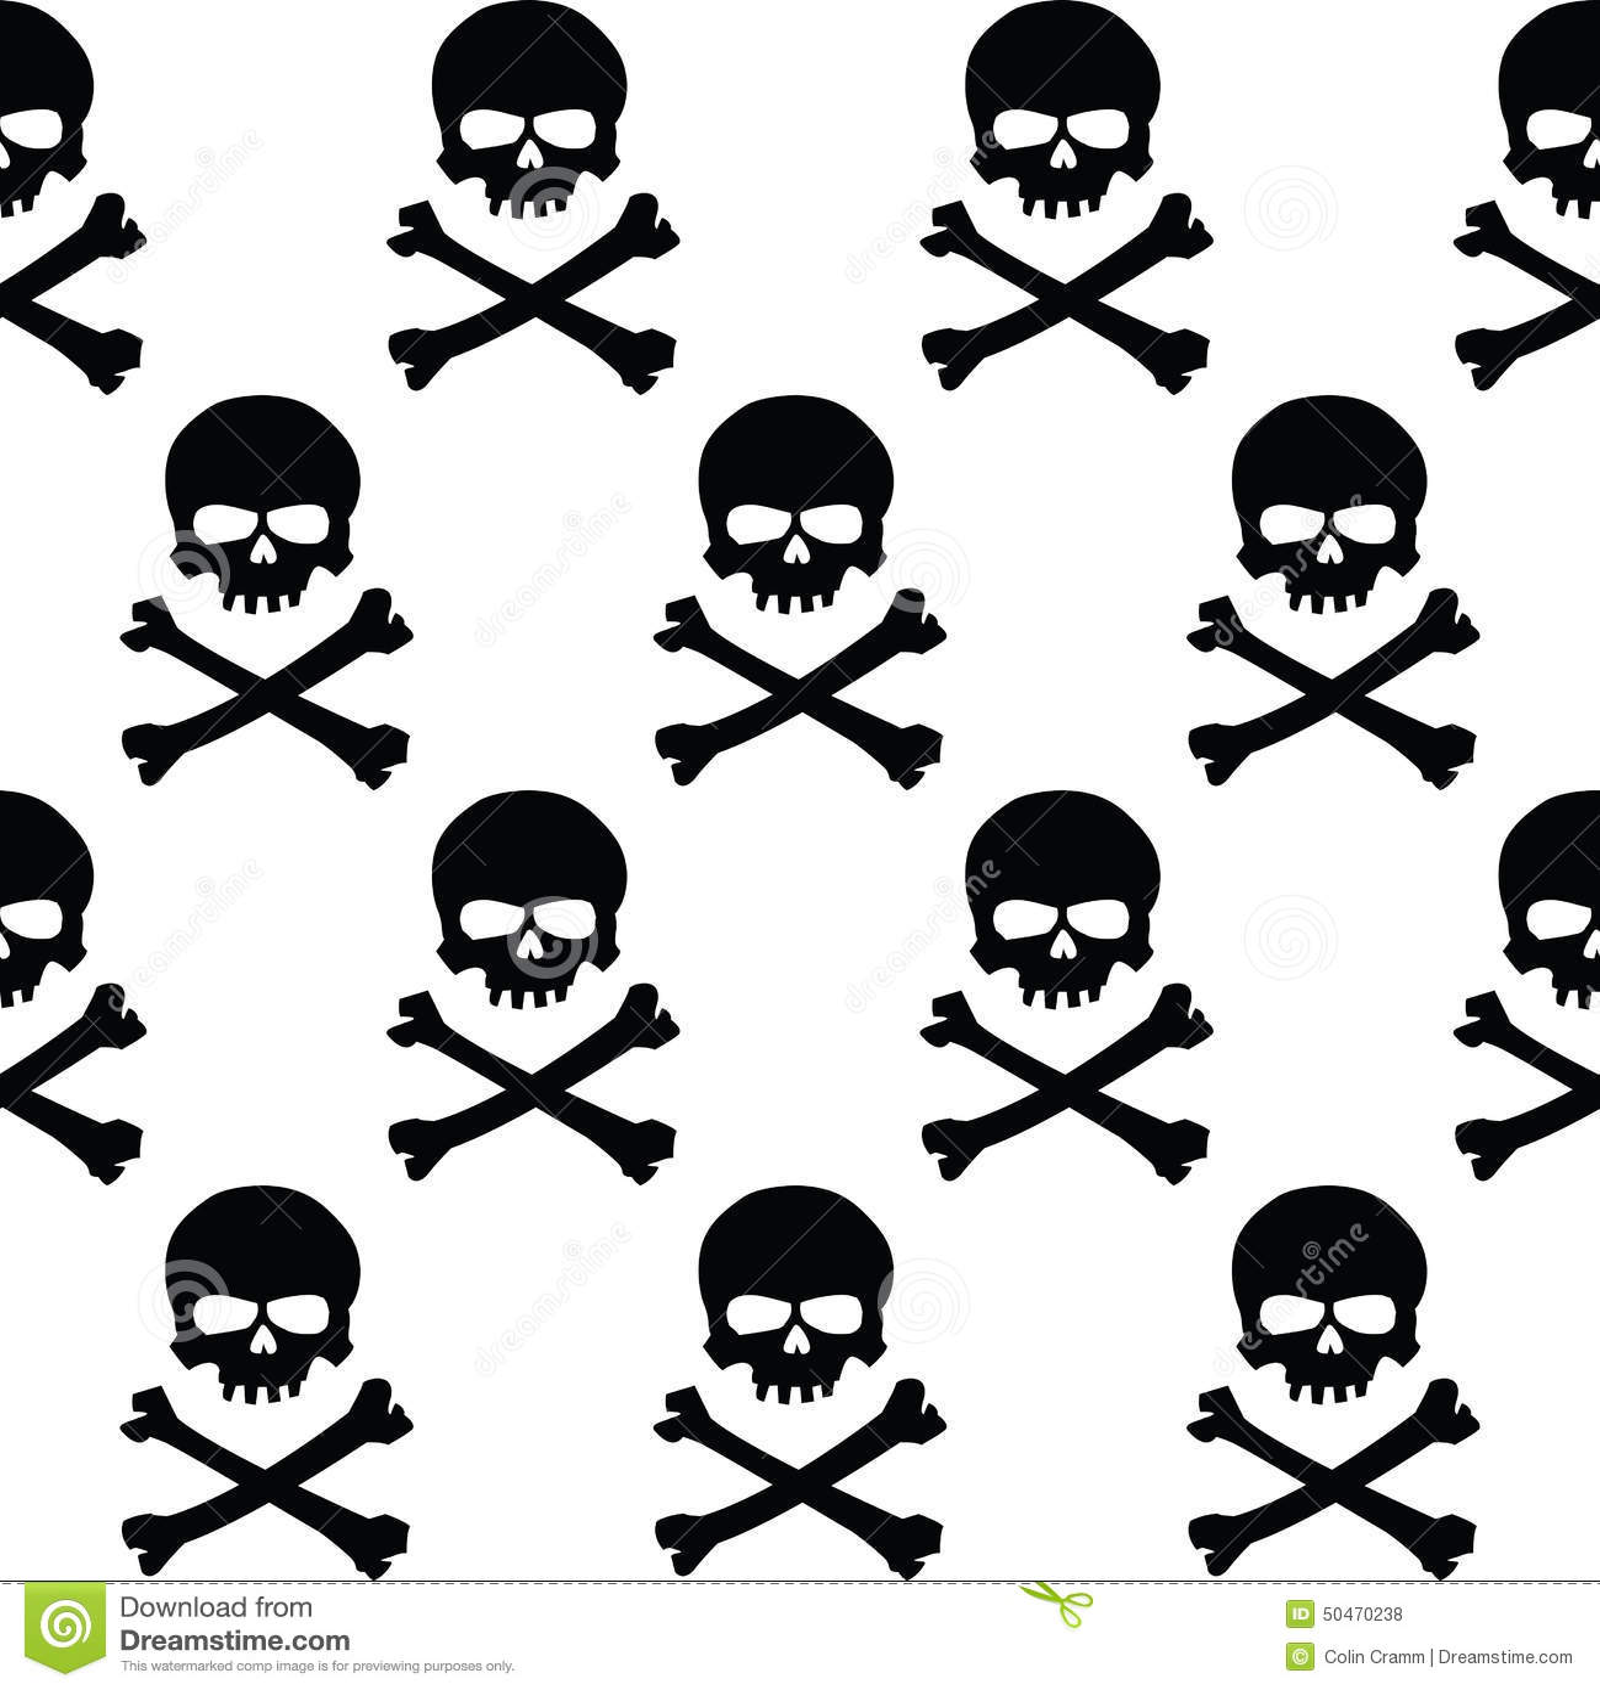 Black And White Skulls Background Stock Vector Illustration Of